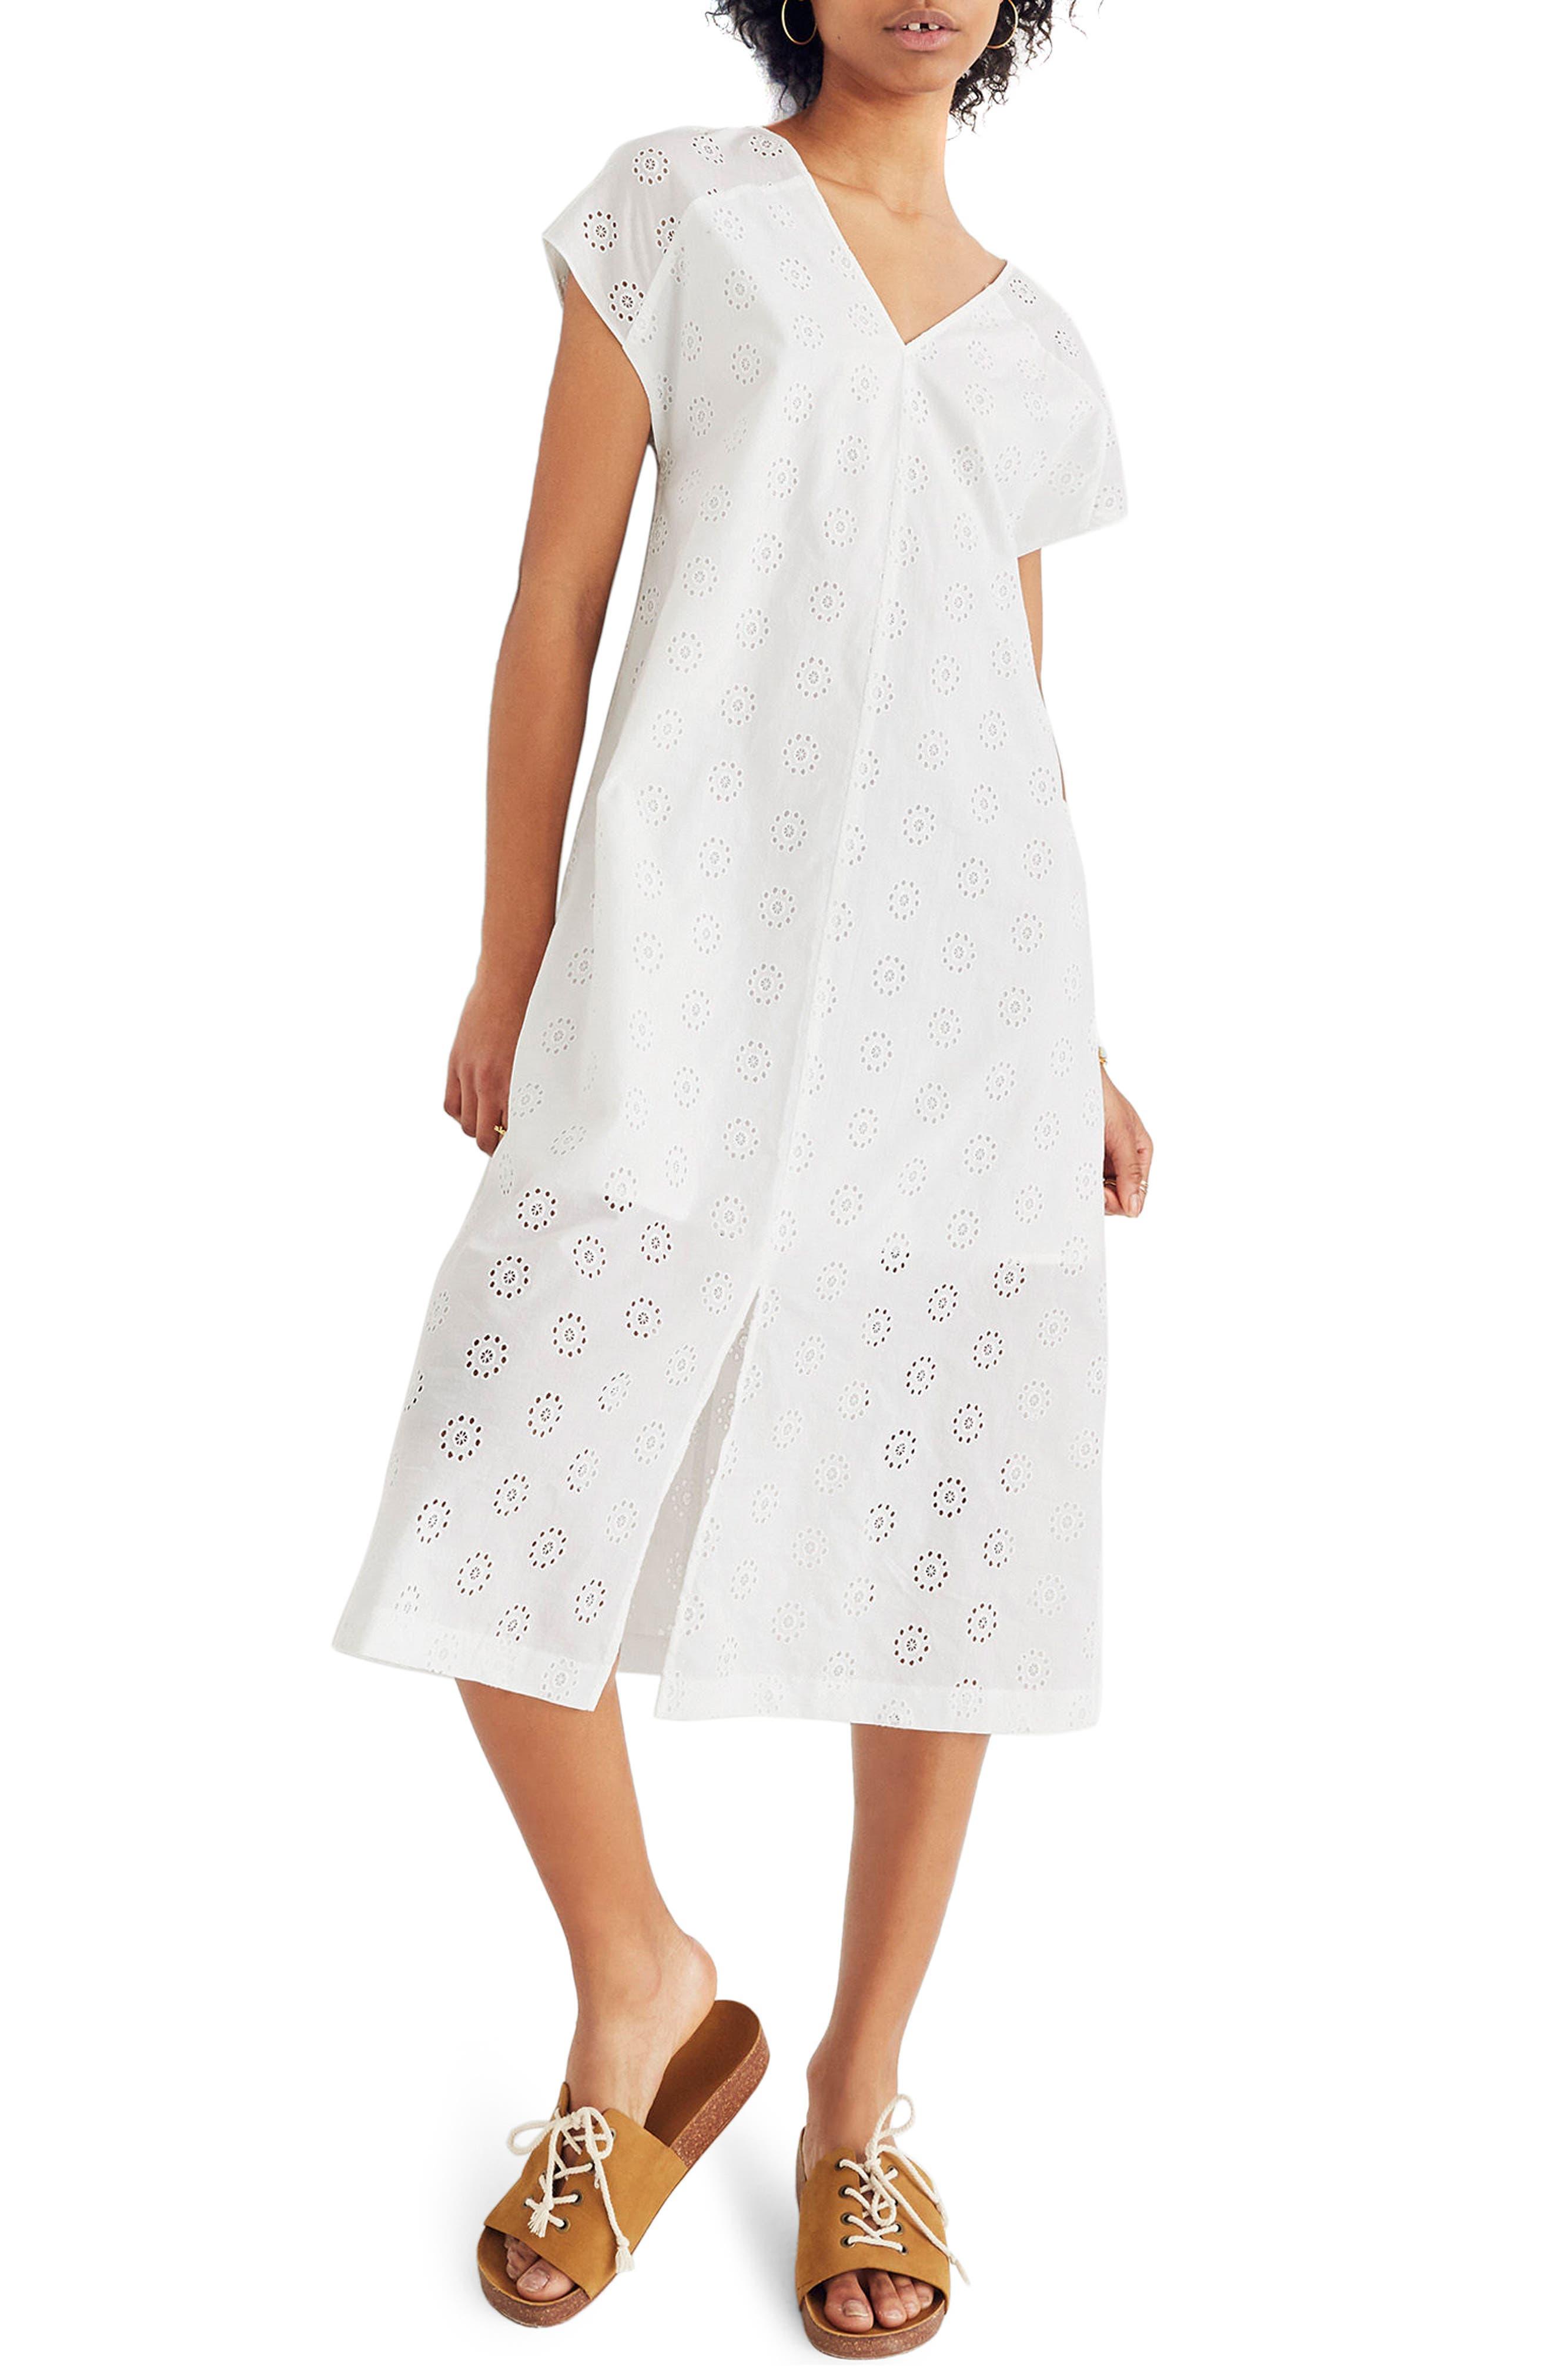 Eyelet Midi Dress,                             Main thumbnail 1, color,                             EYELET WHITE